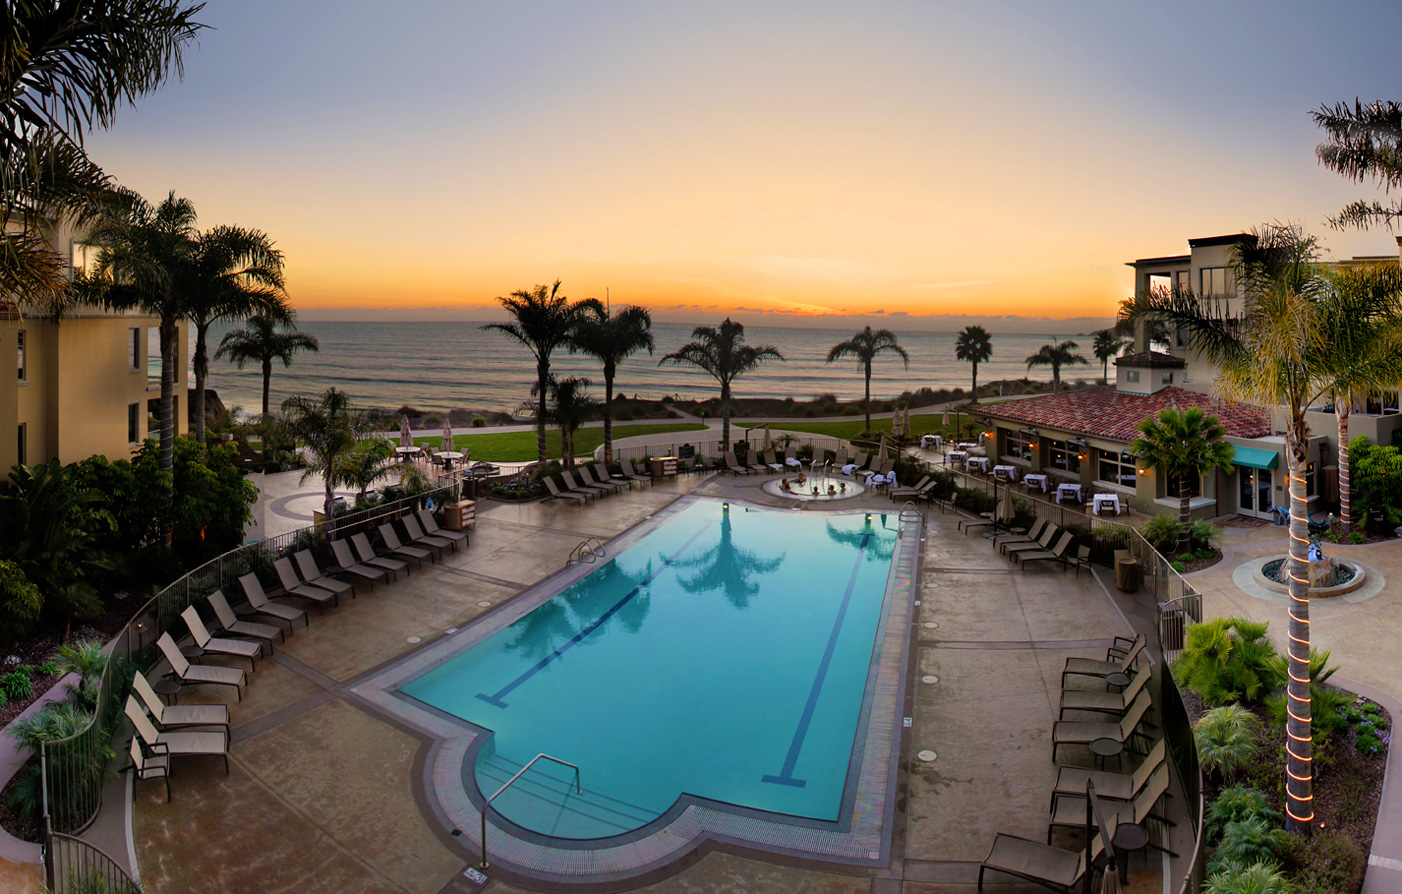 Dolphin Hotel Pismo Beach